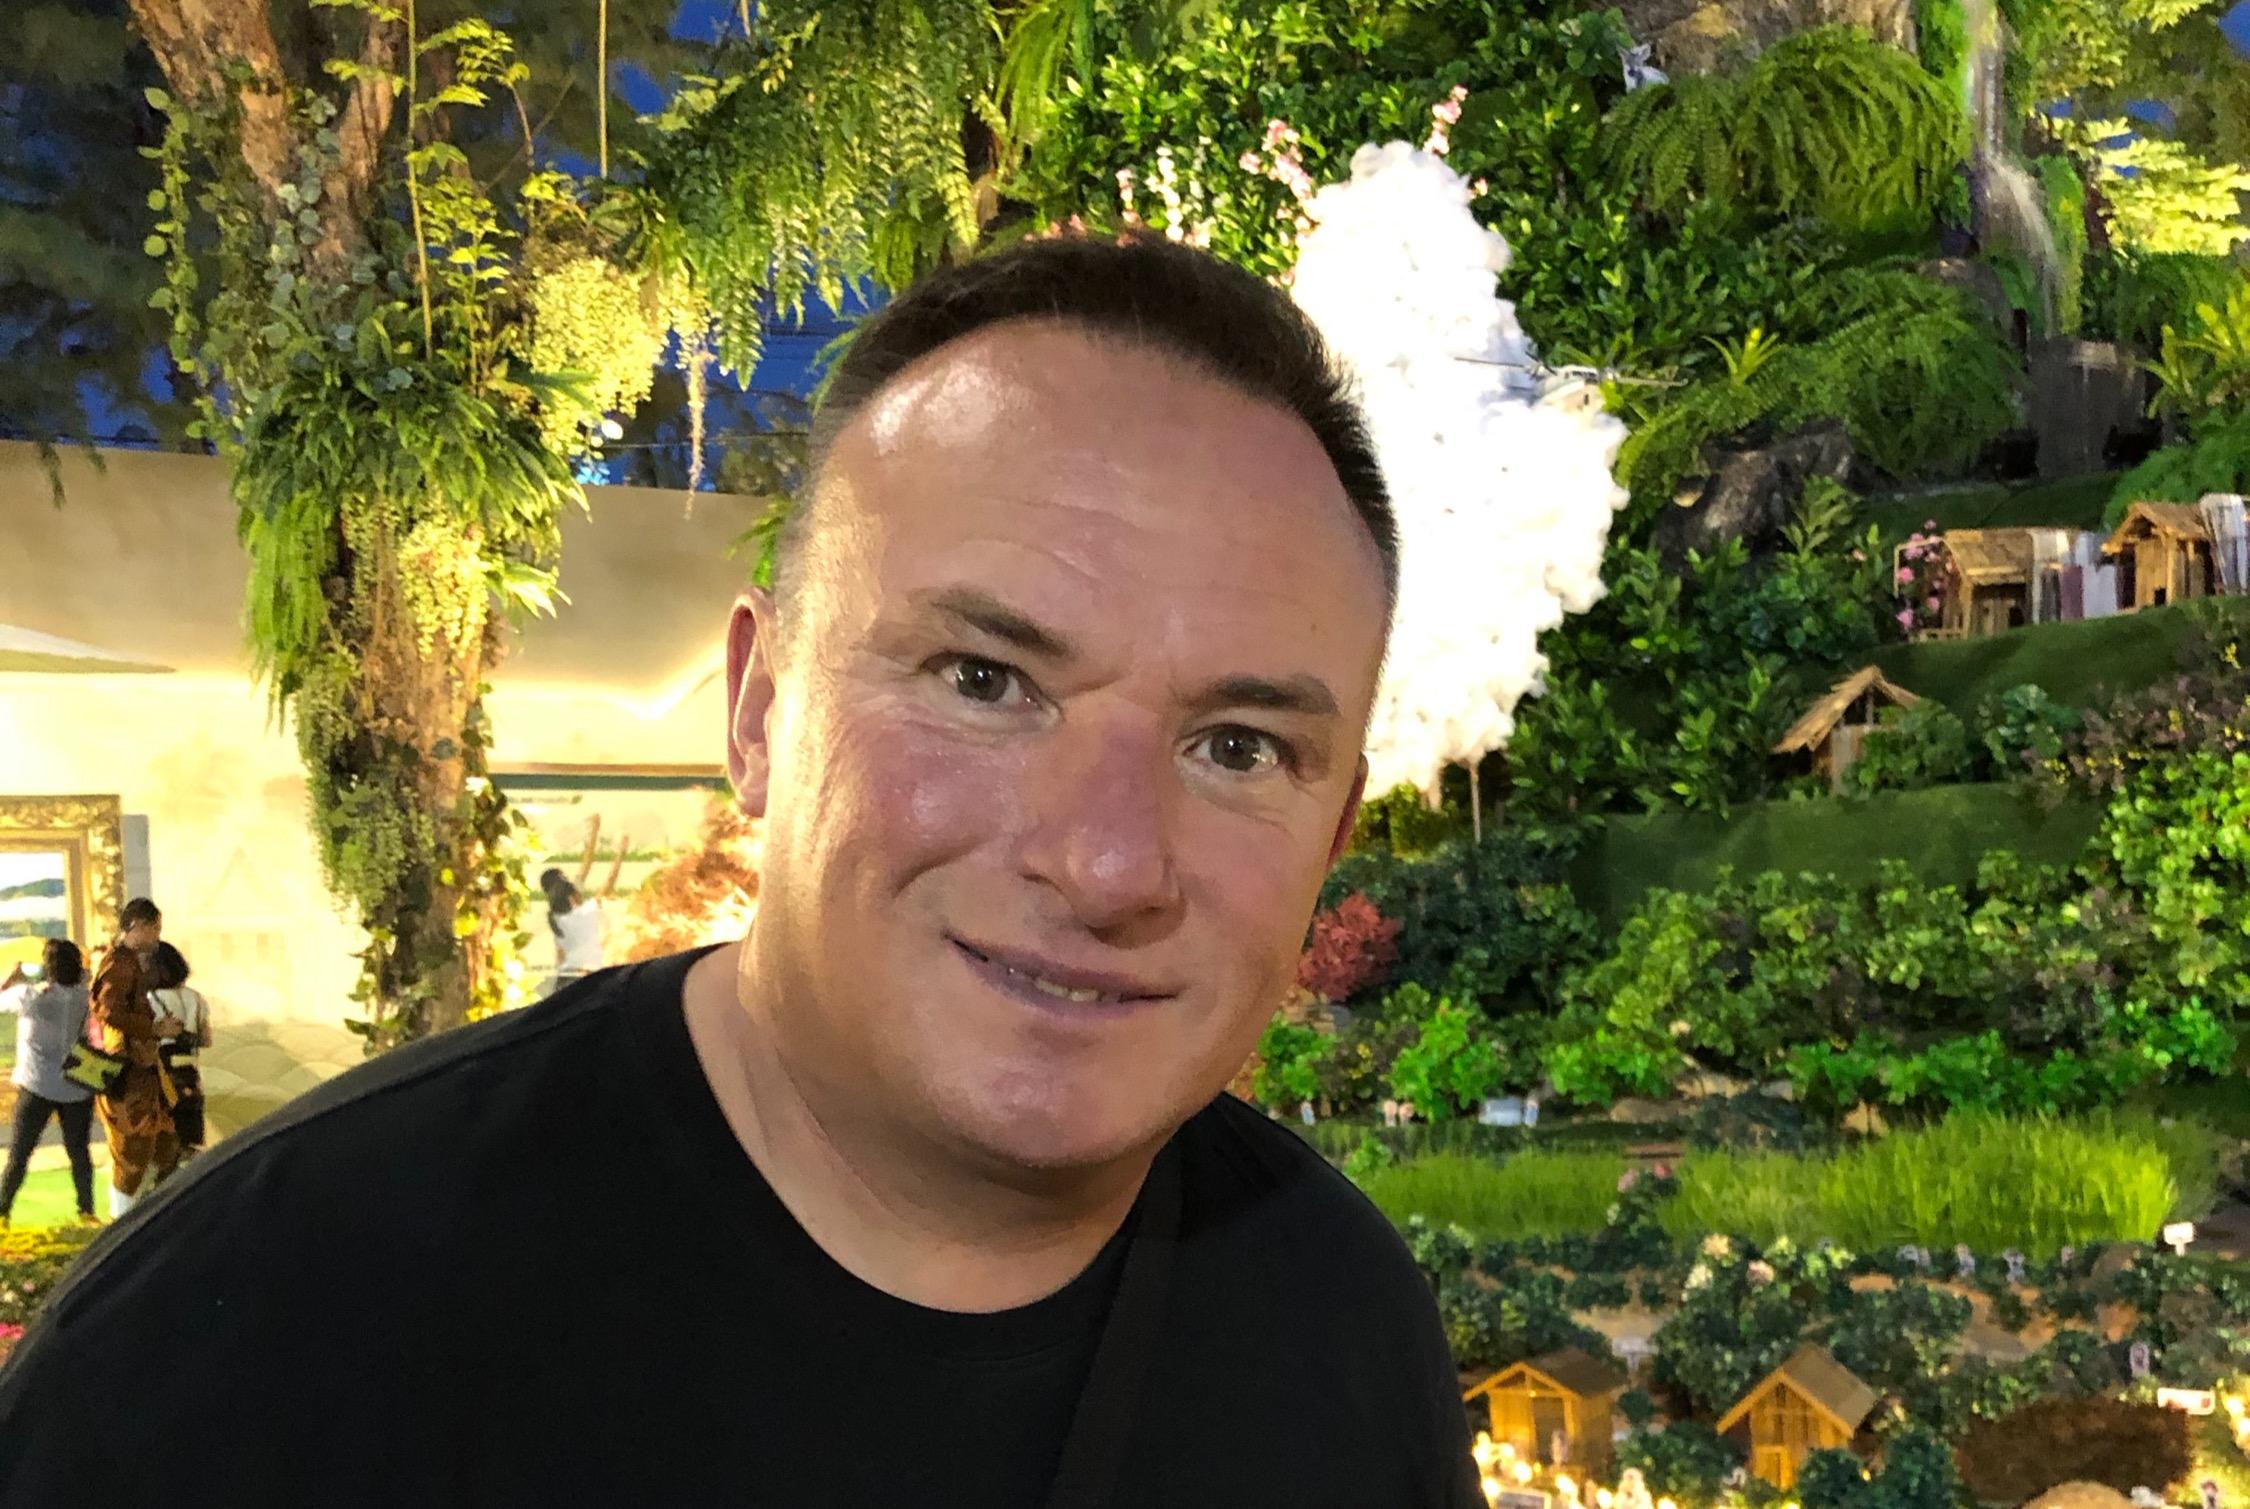 Adrian Vaughan